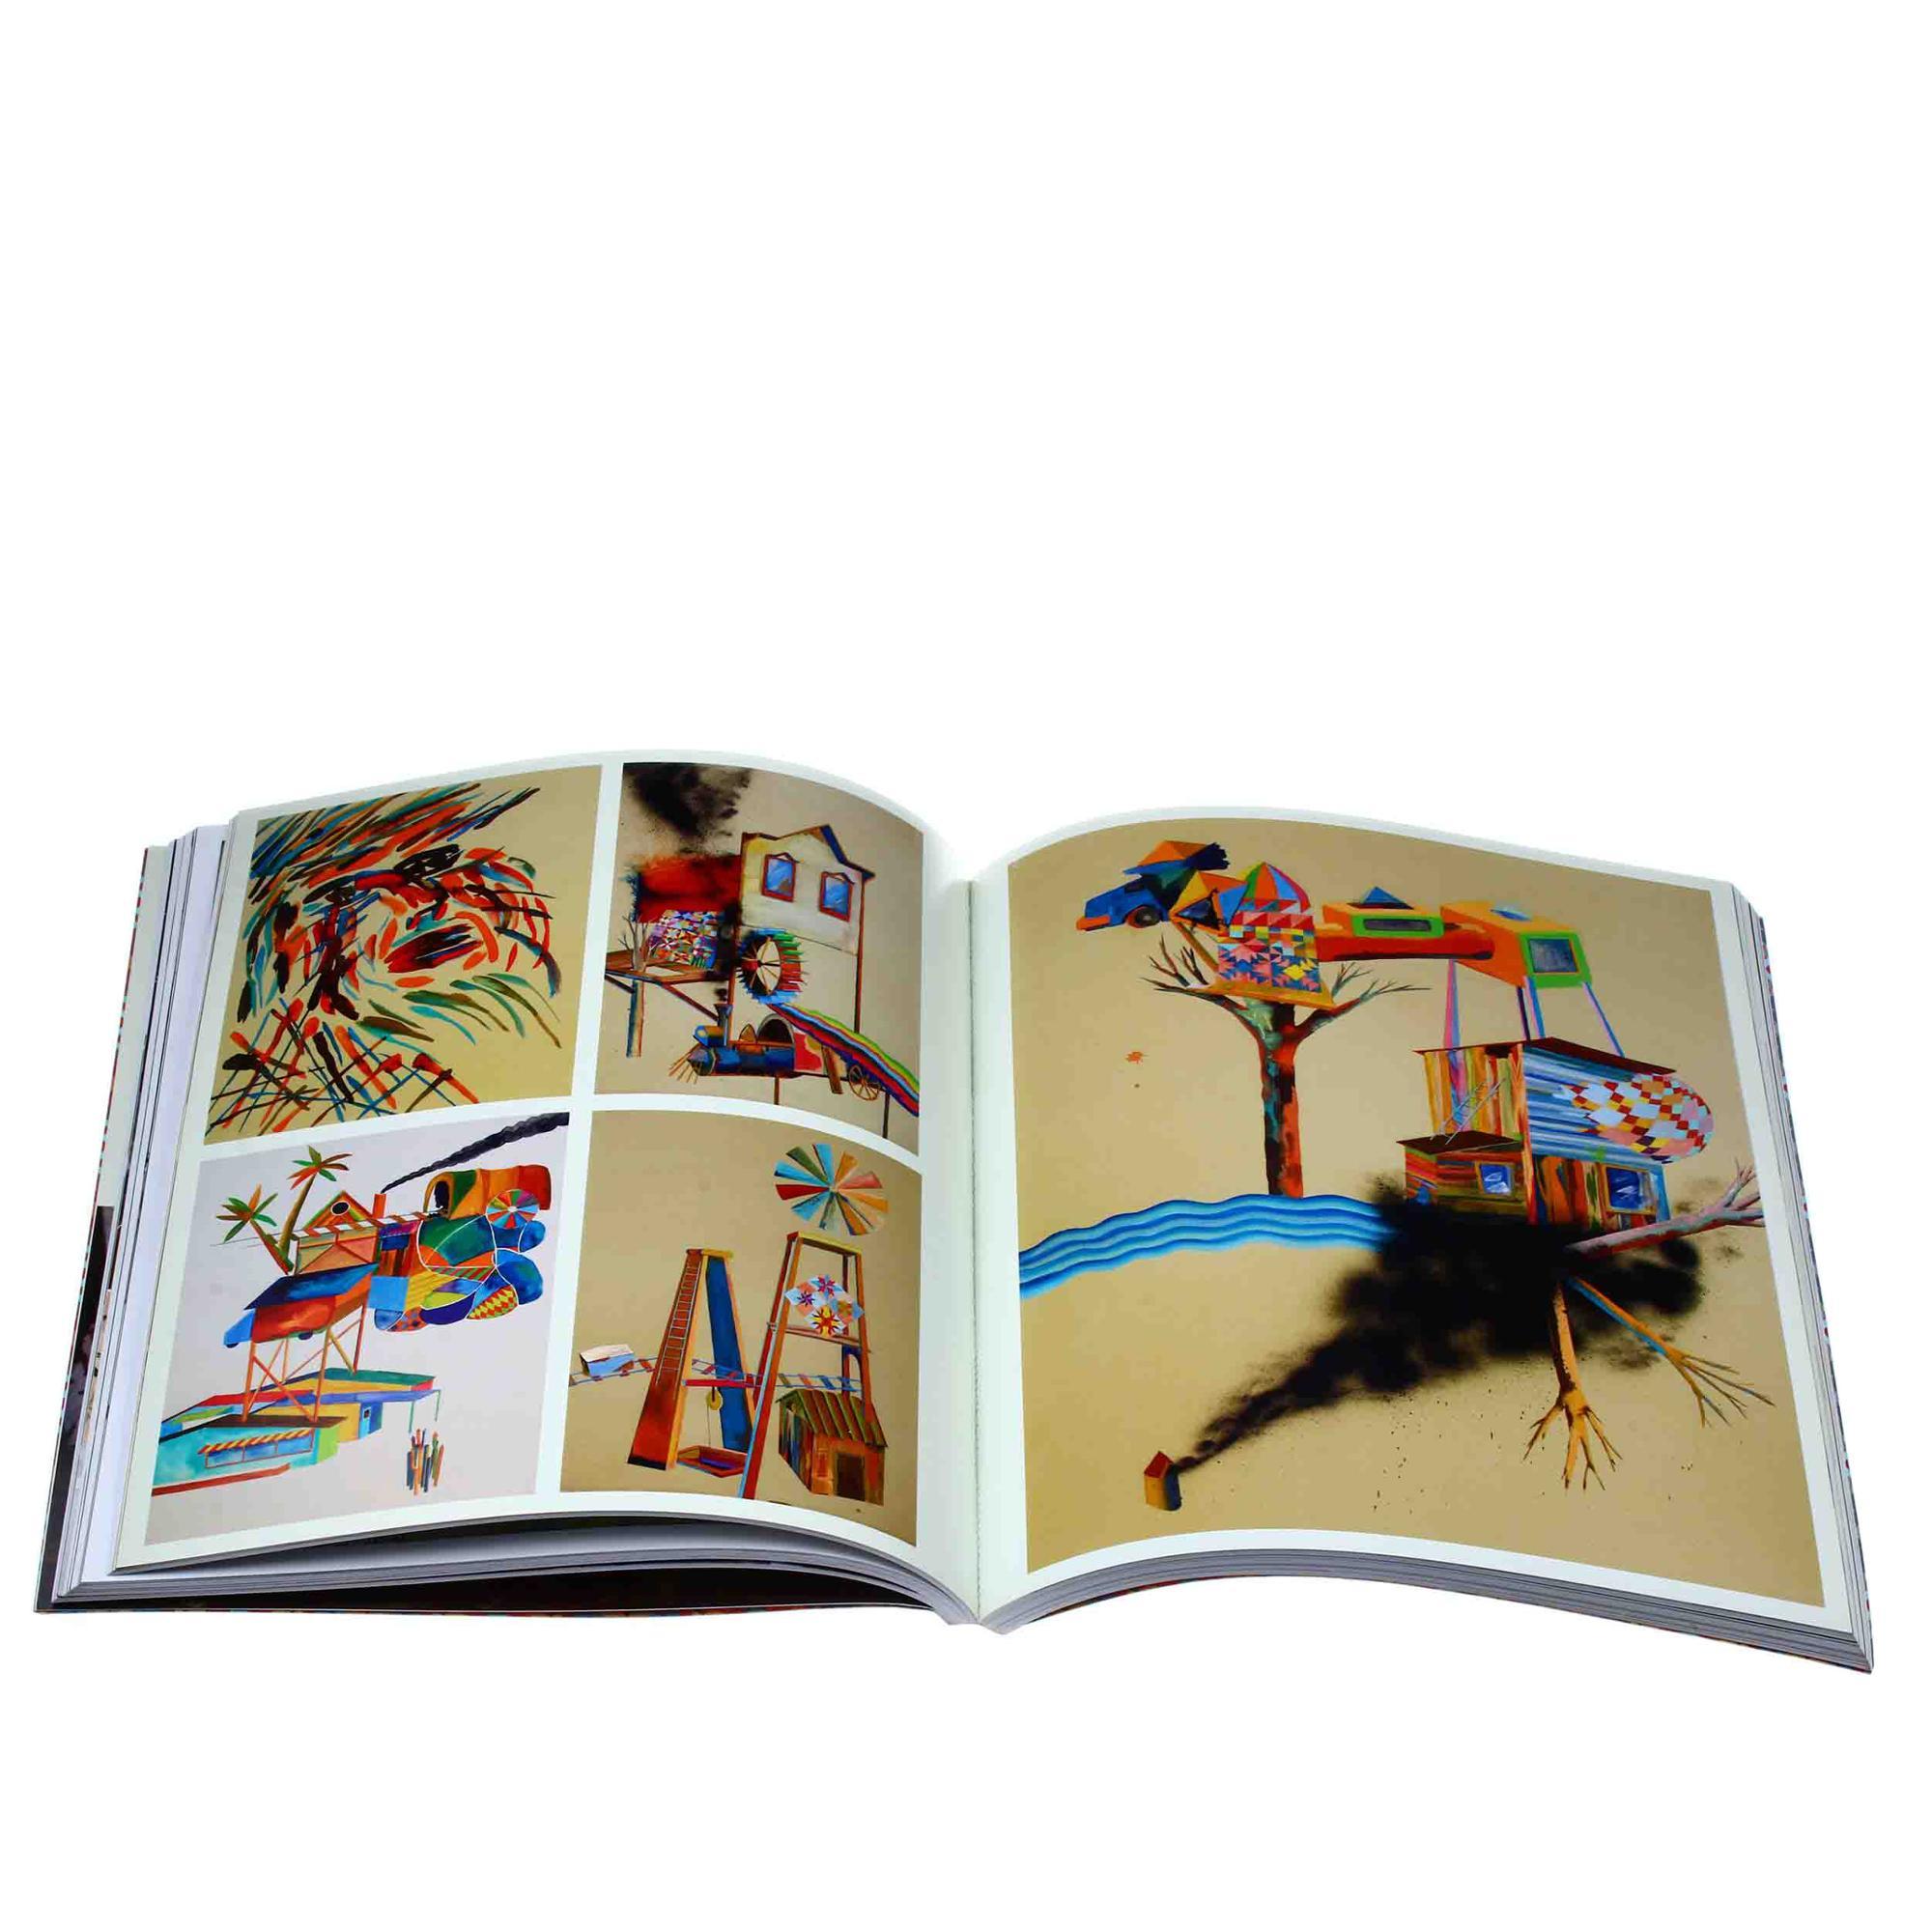 Peyzaj Sanat Resim Tuval Boyama Kitabi Buy Boyama Kitabi Product